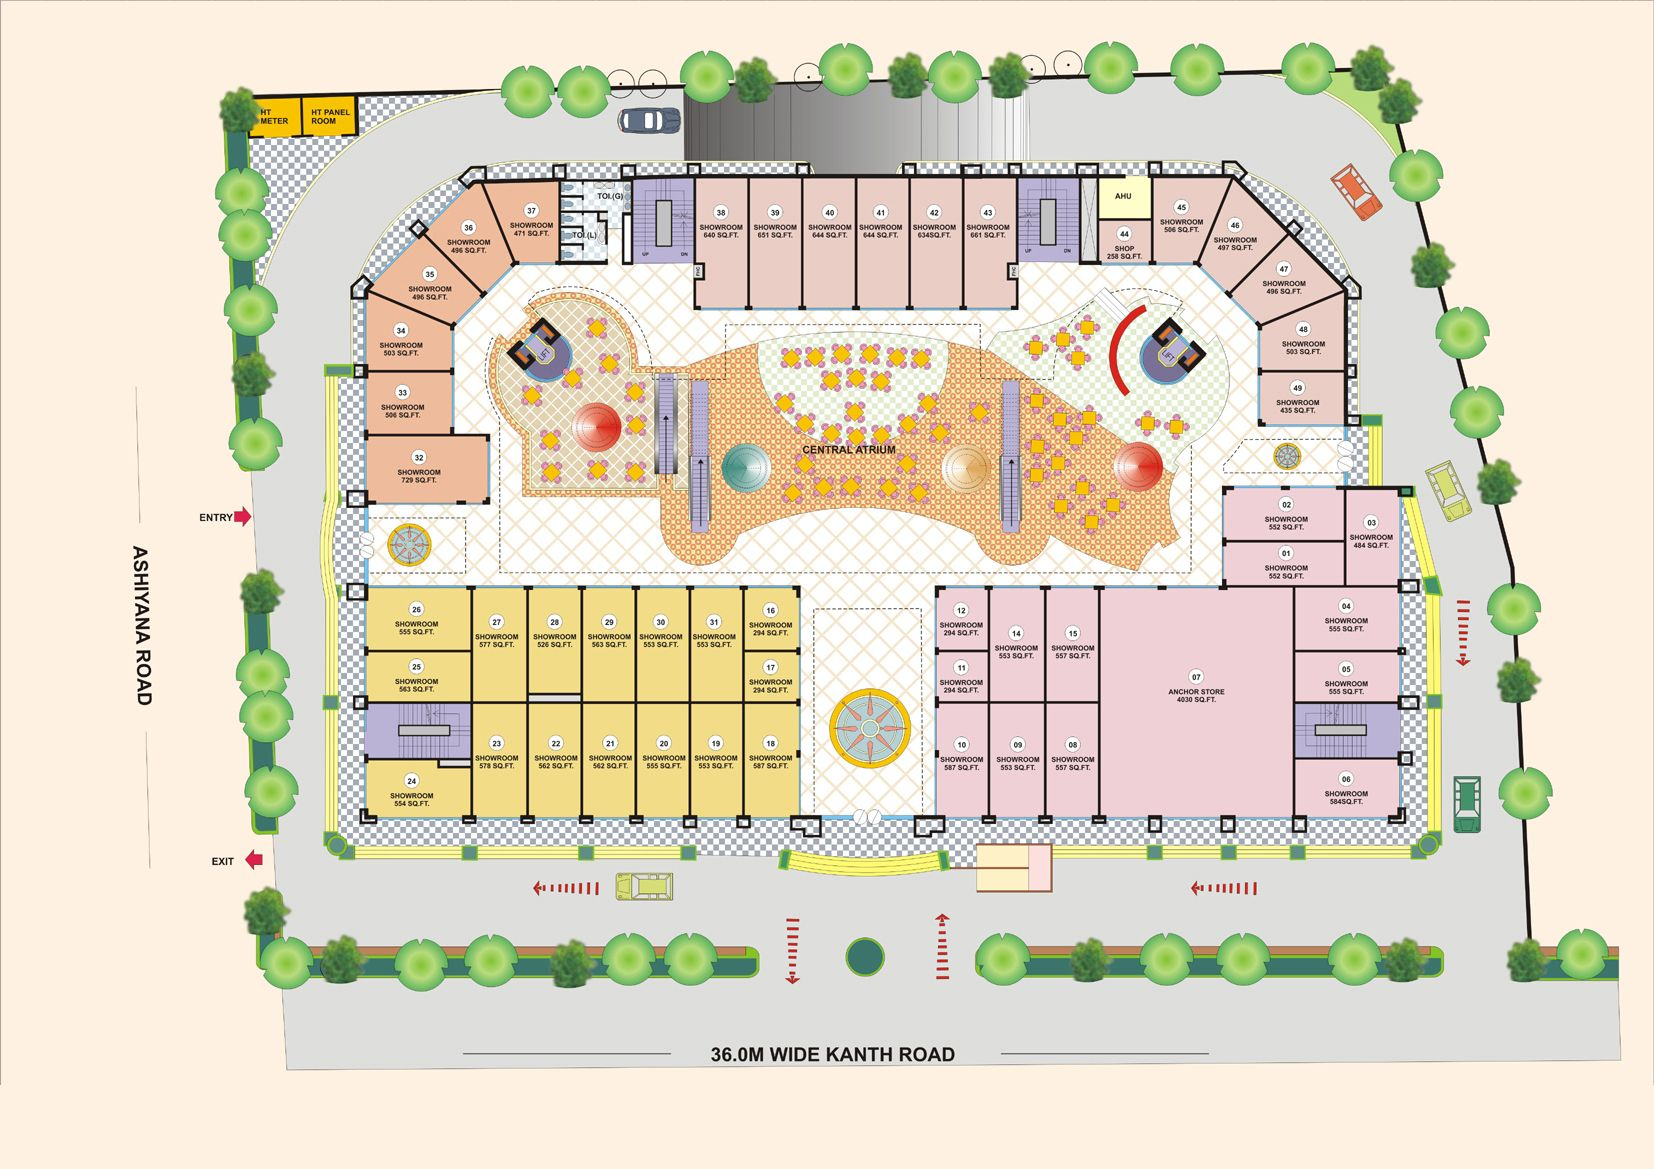 floor plan of a shopping mall plan home plans ideas picture shopping mall floor plan architecture pinterest